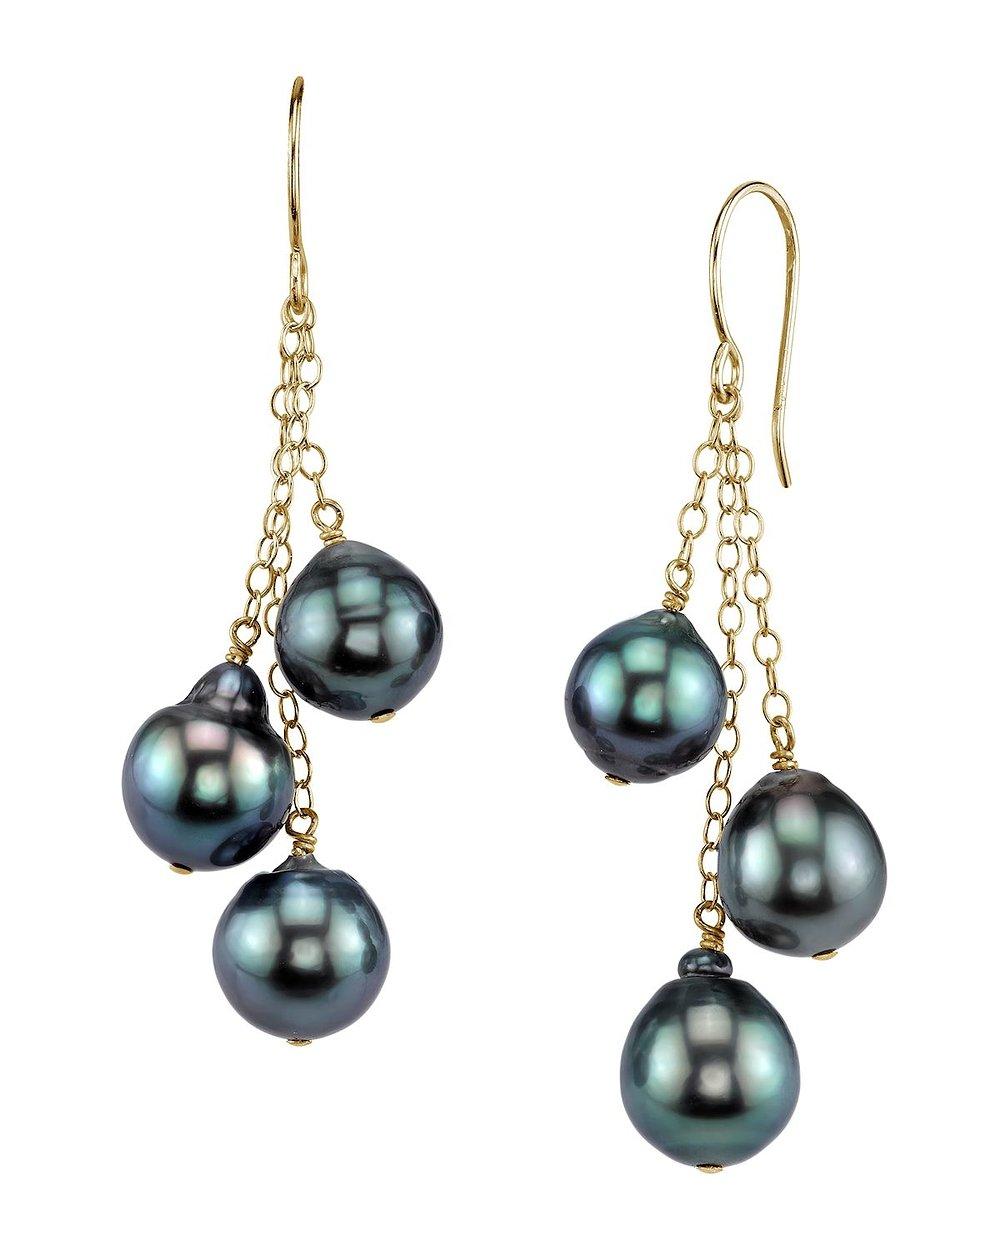 14K Gold Tahitian South Sea Cultured Drop Pearl Cluster Earrings